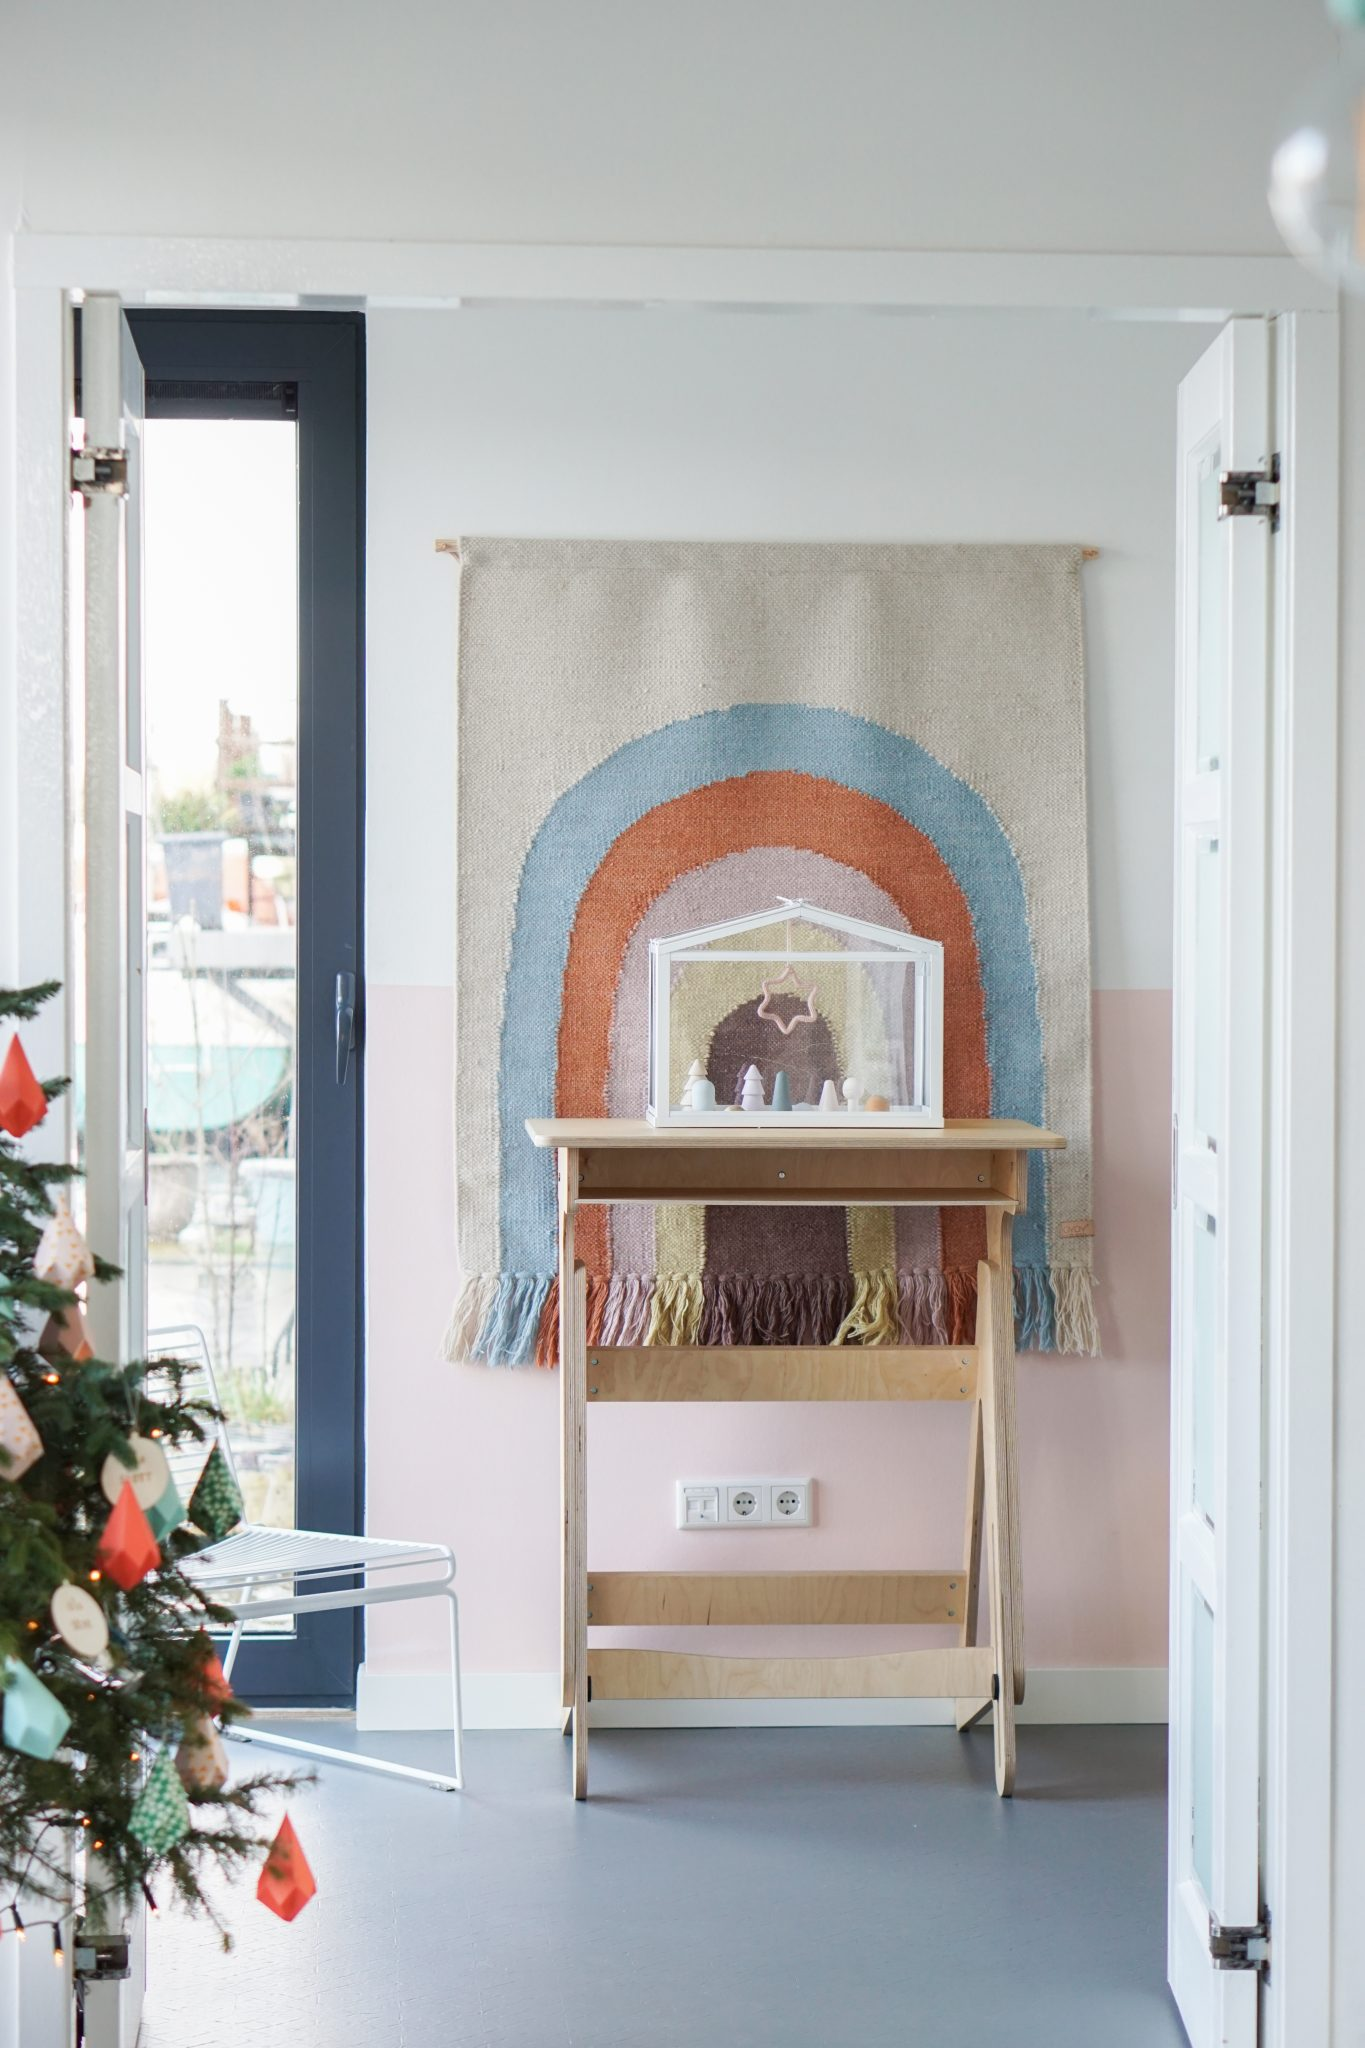 kerst interieur wandkleed